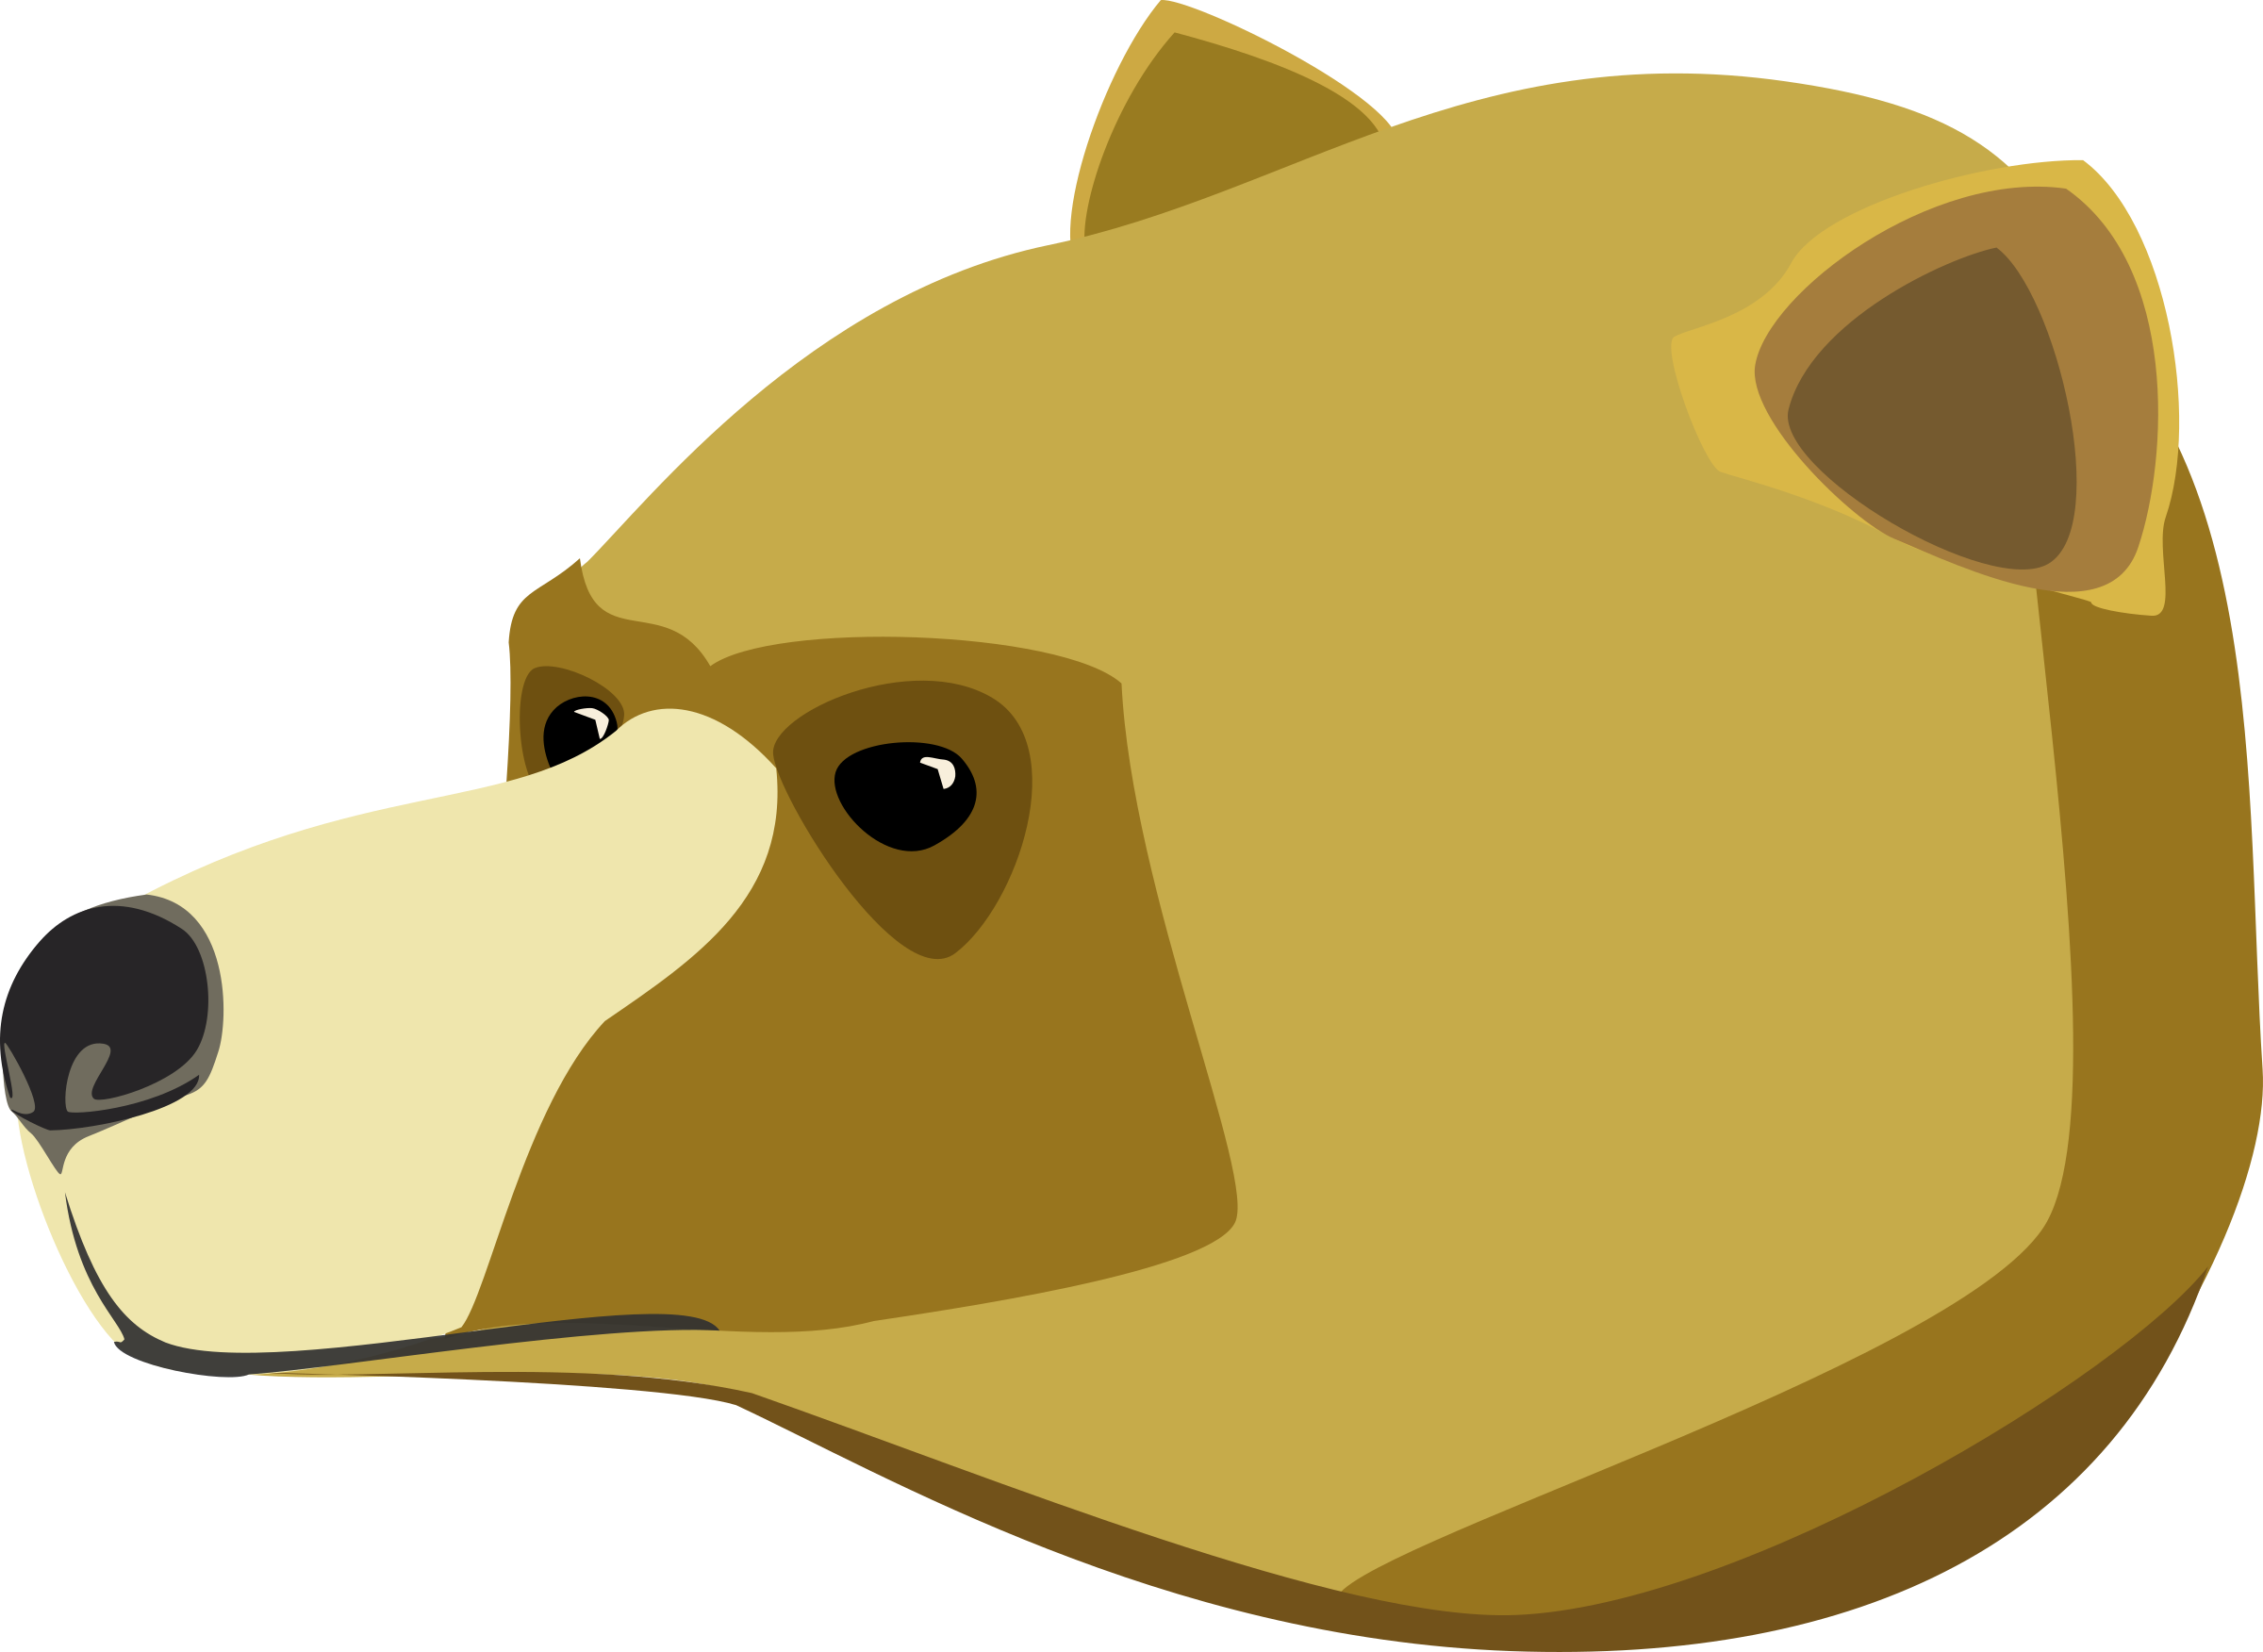 Big image png. Clipart bear carnivore